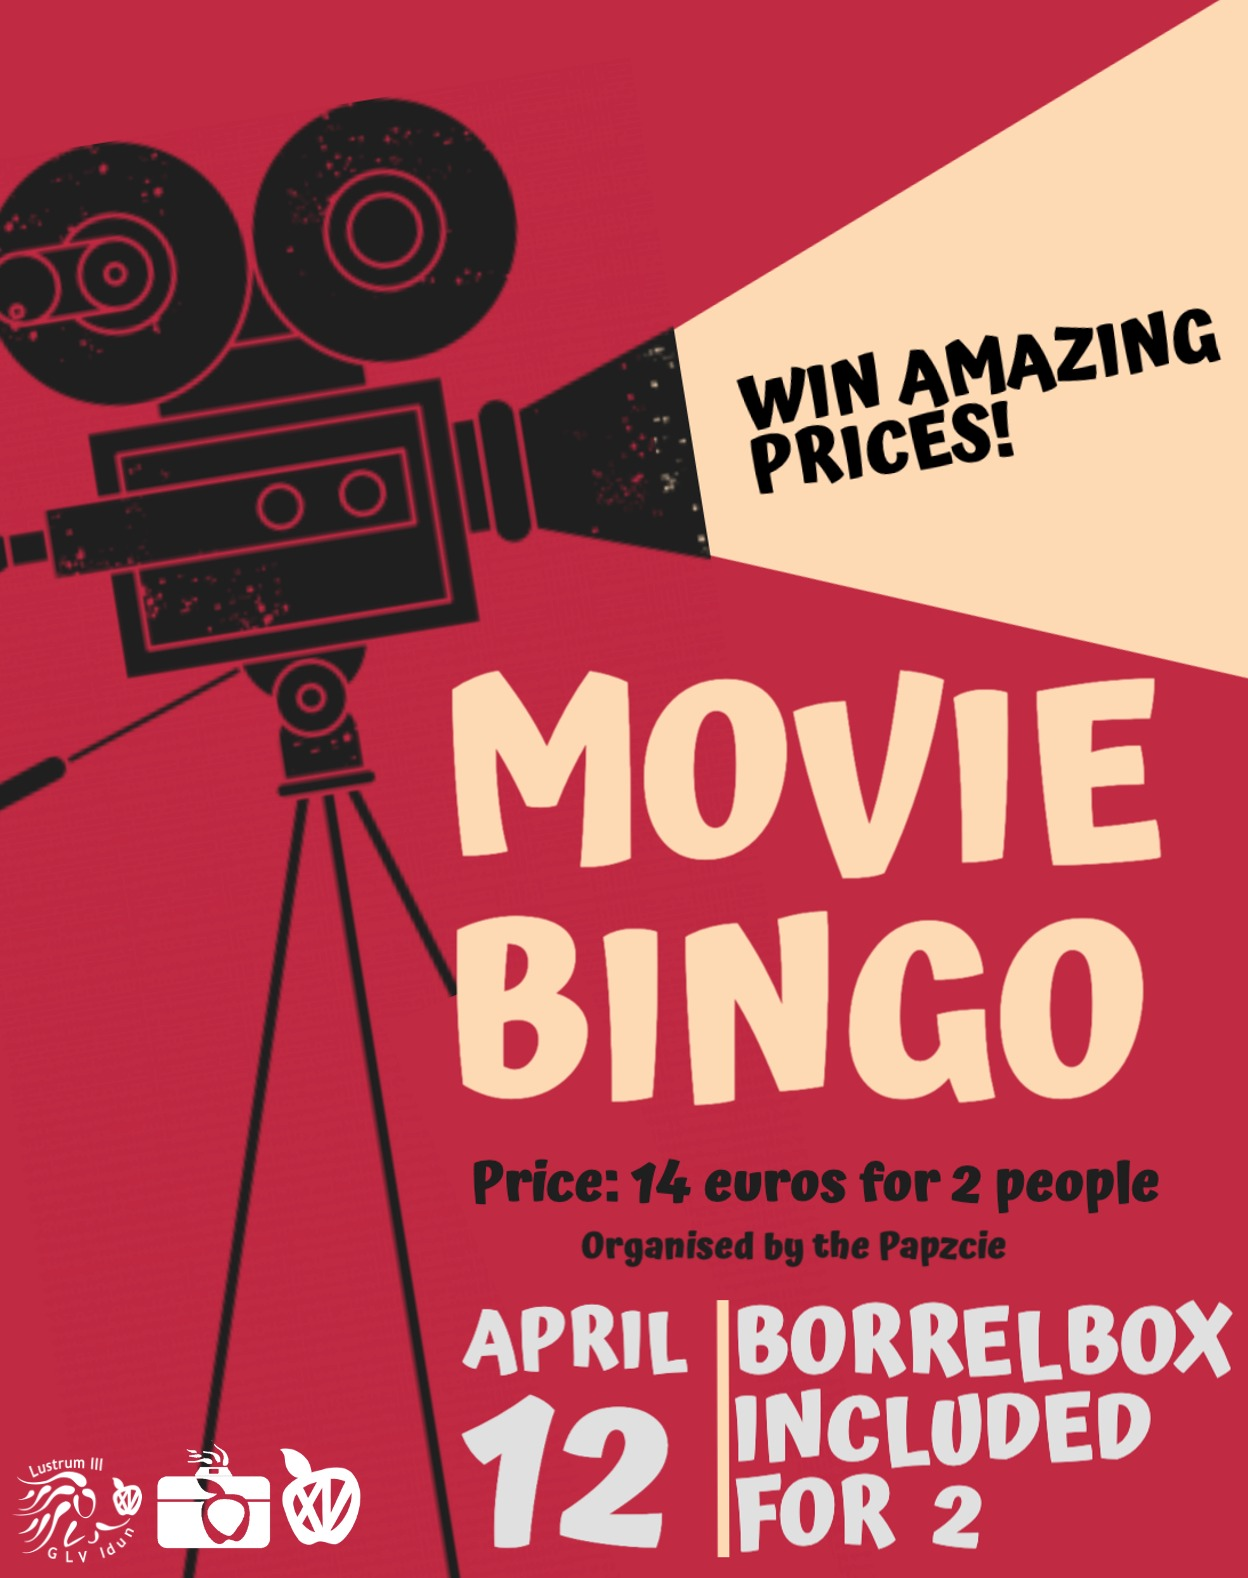 Moviebingo